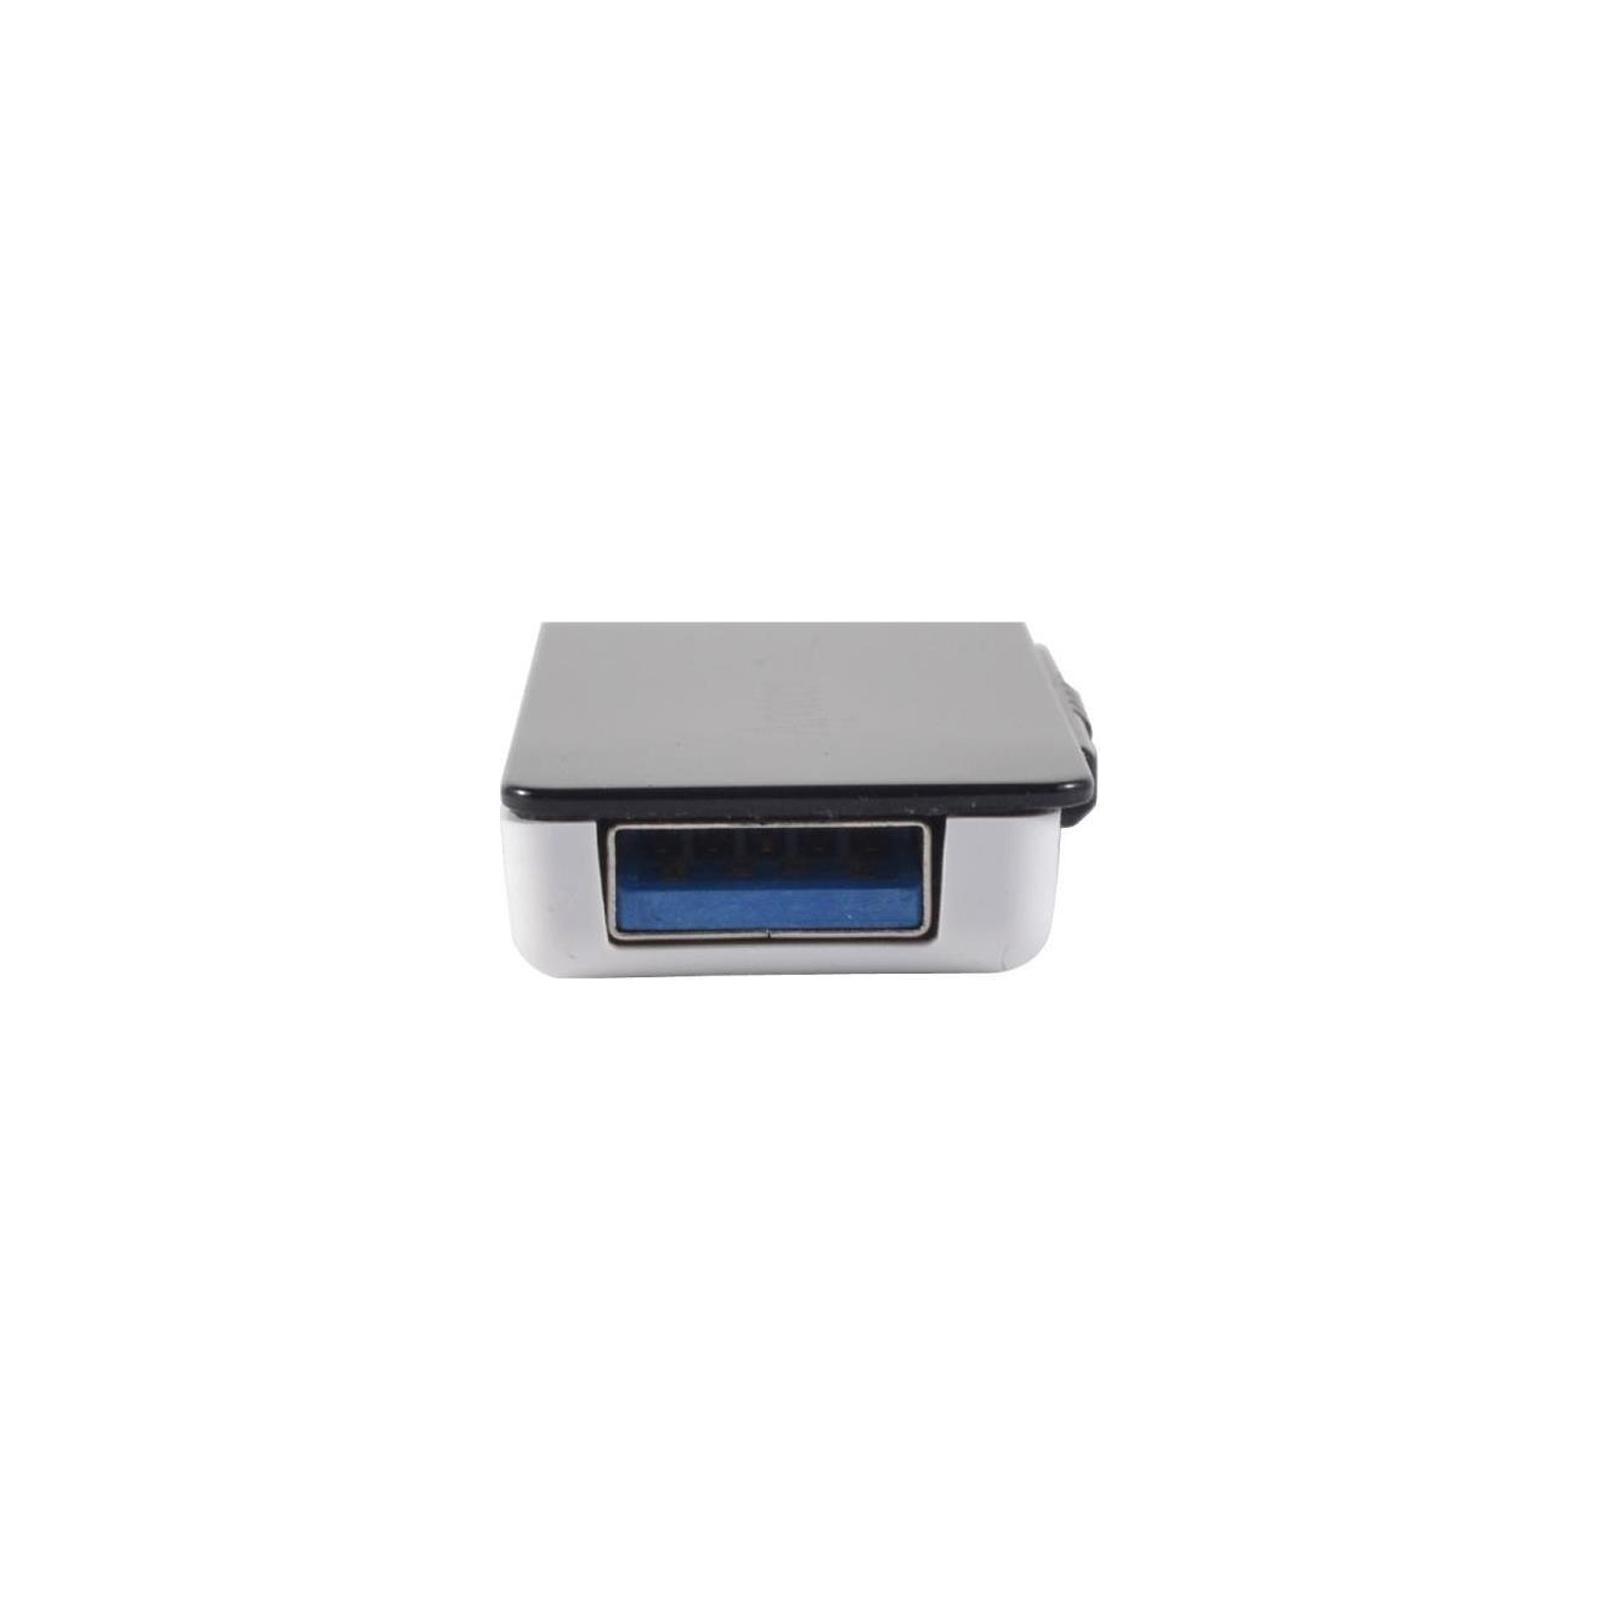 USB флеш накопитель 64GB AH350 Black RP USB3.0 Apacer (AP64GAH350B-1) изображение 7